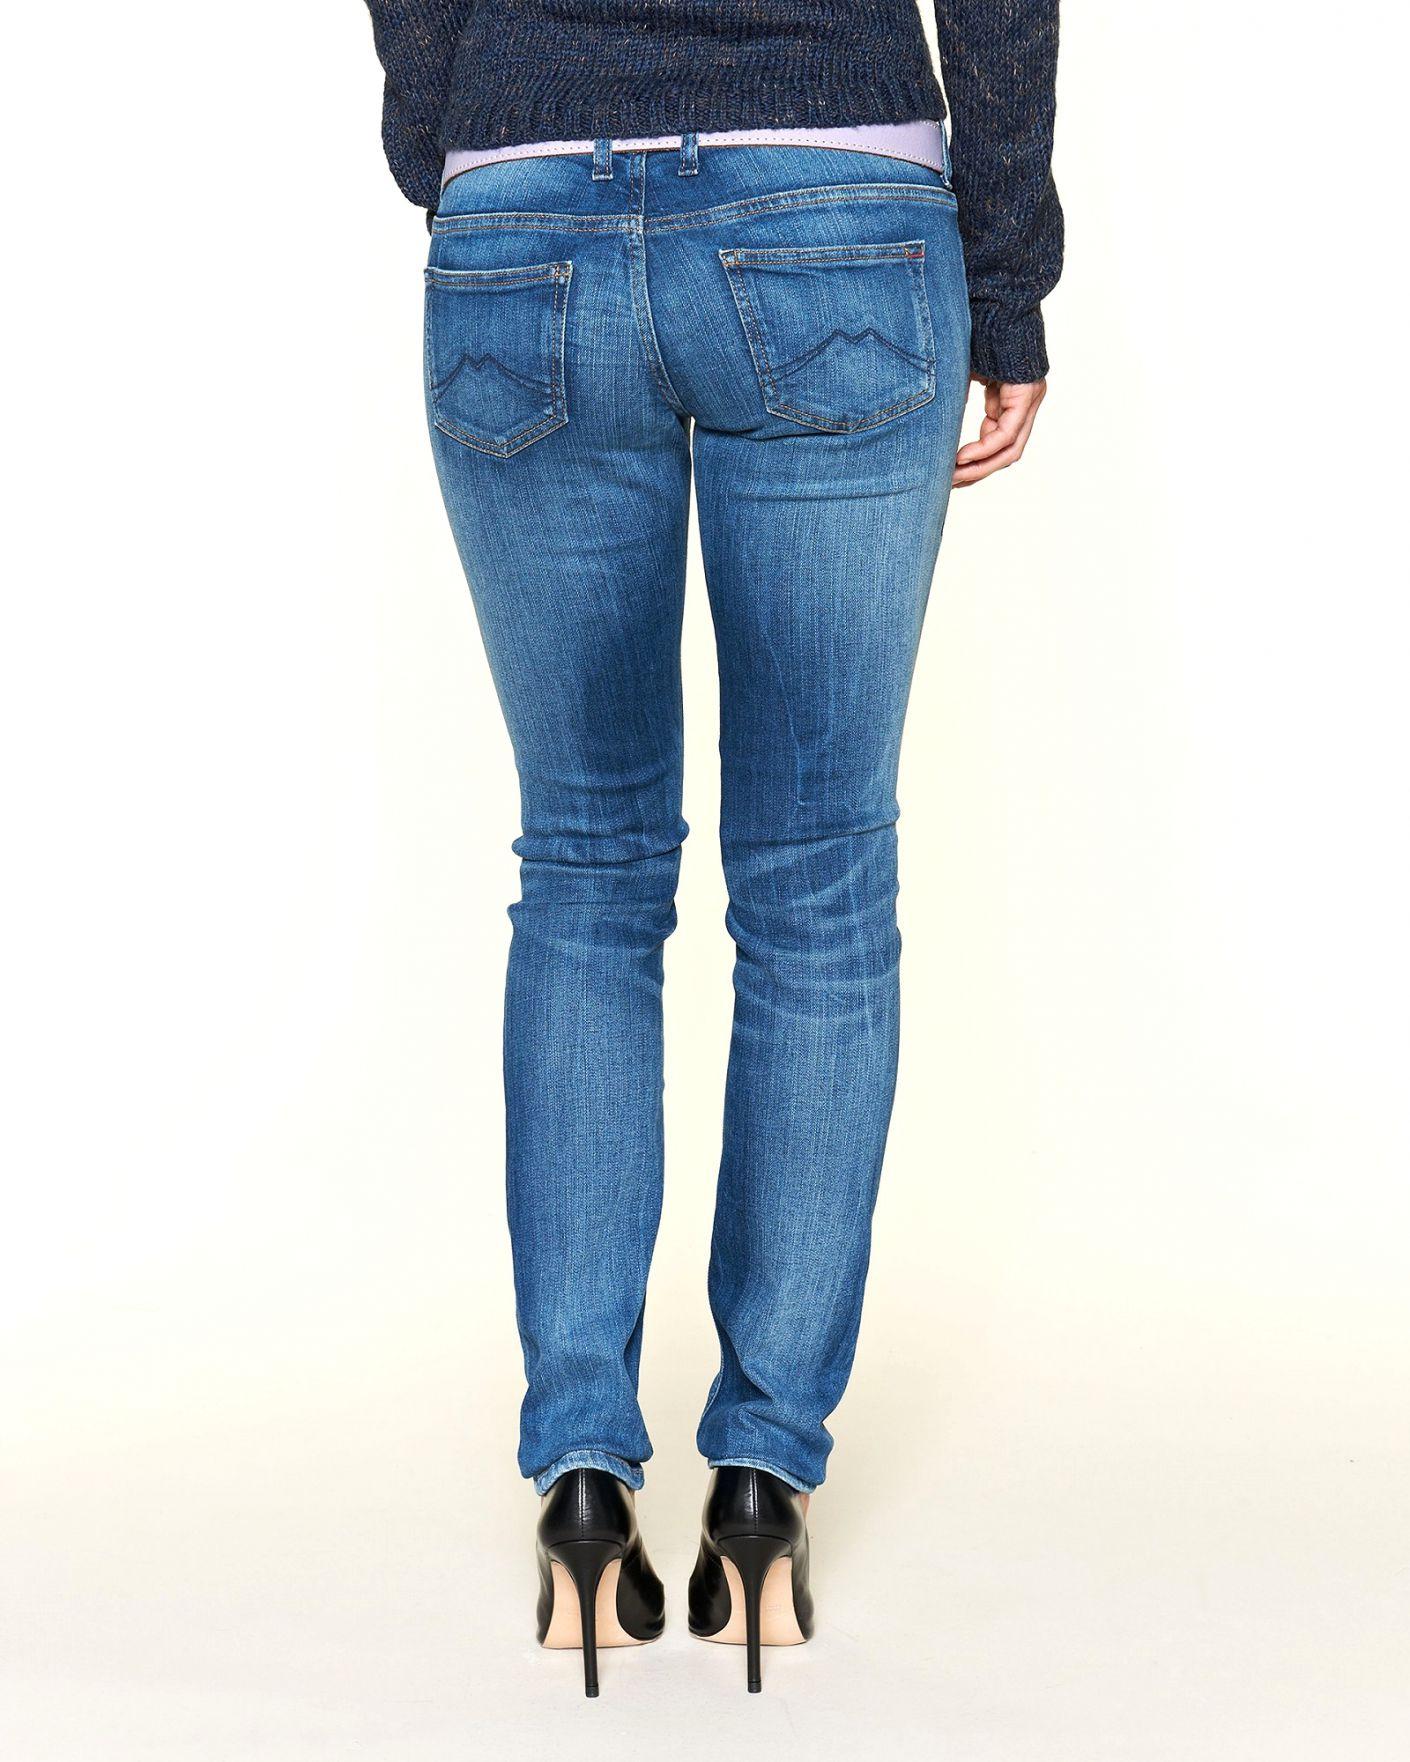 Dámské džíny Mustang Gina 3588-5039-536 49623c112b